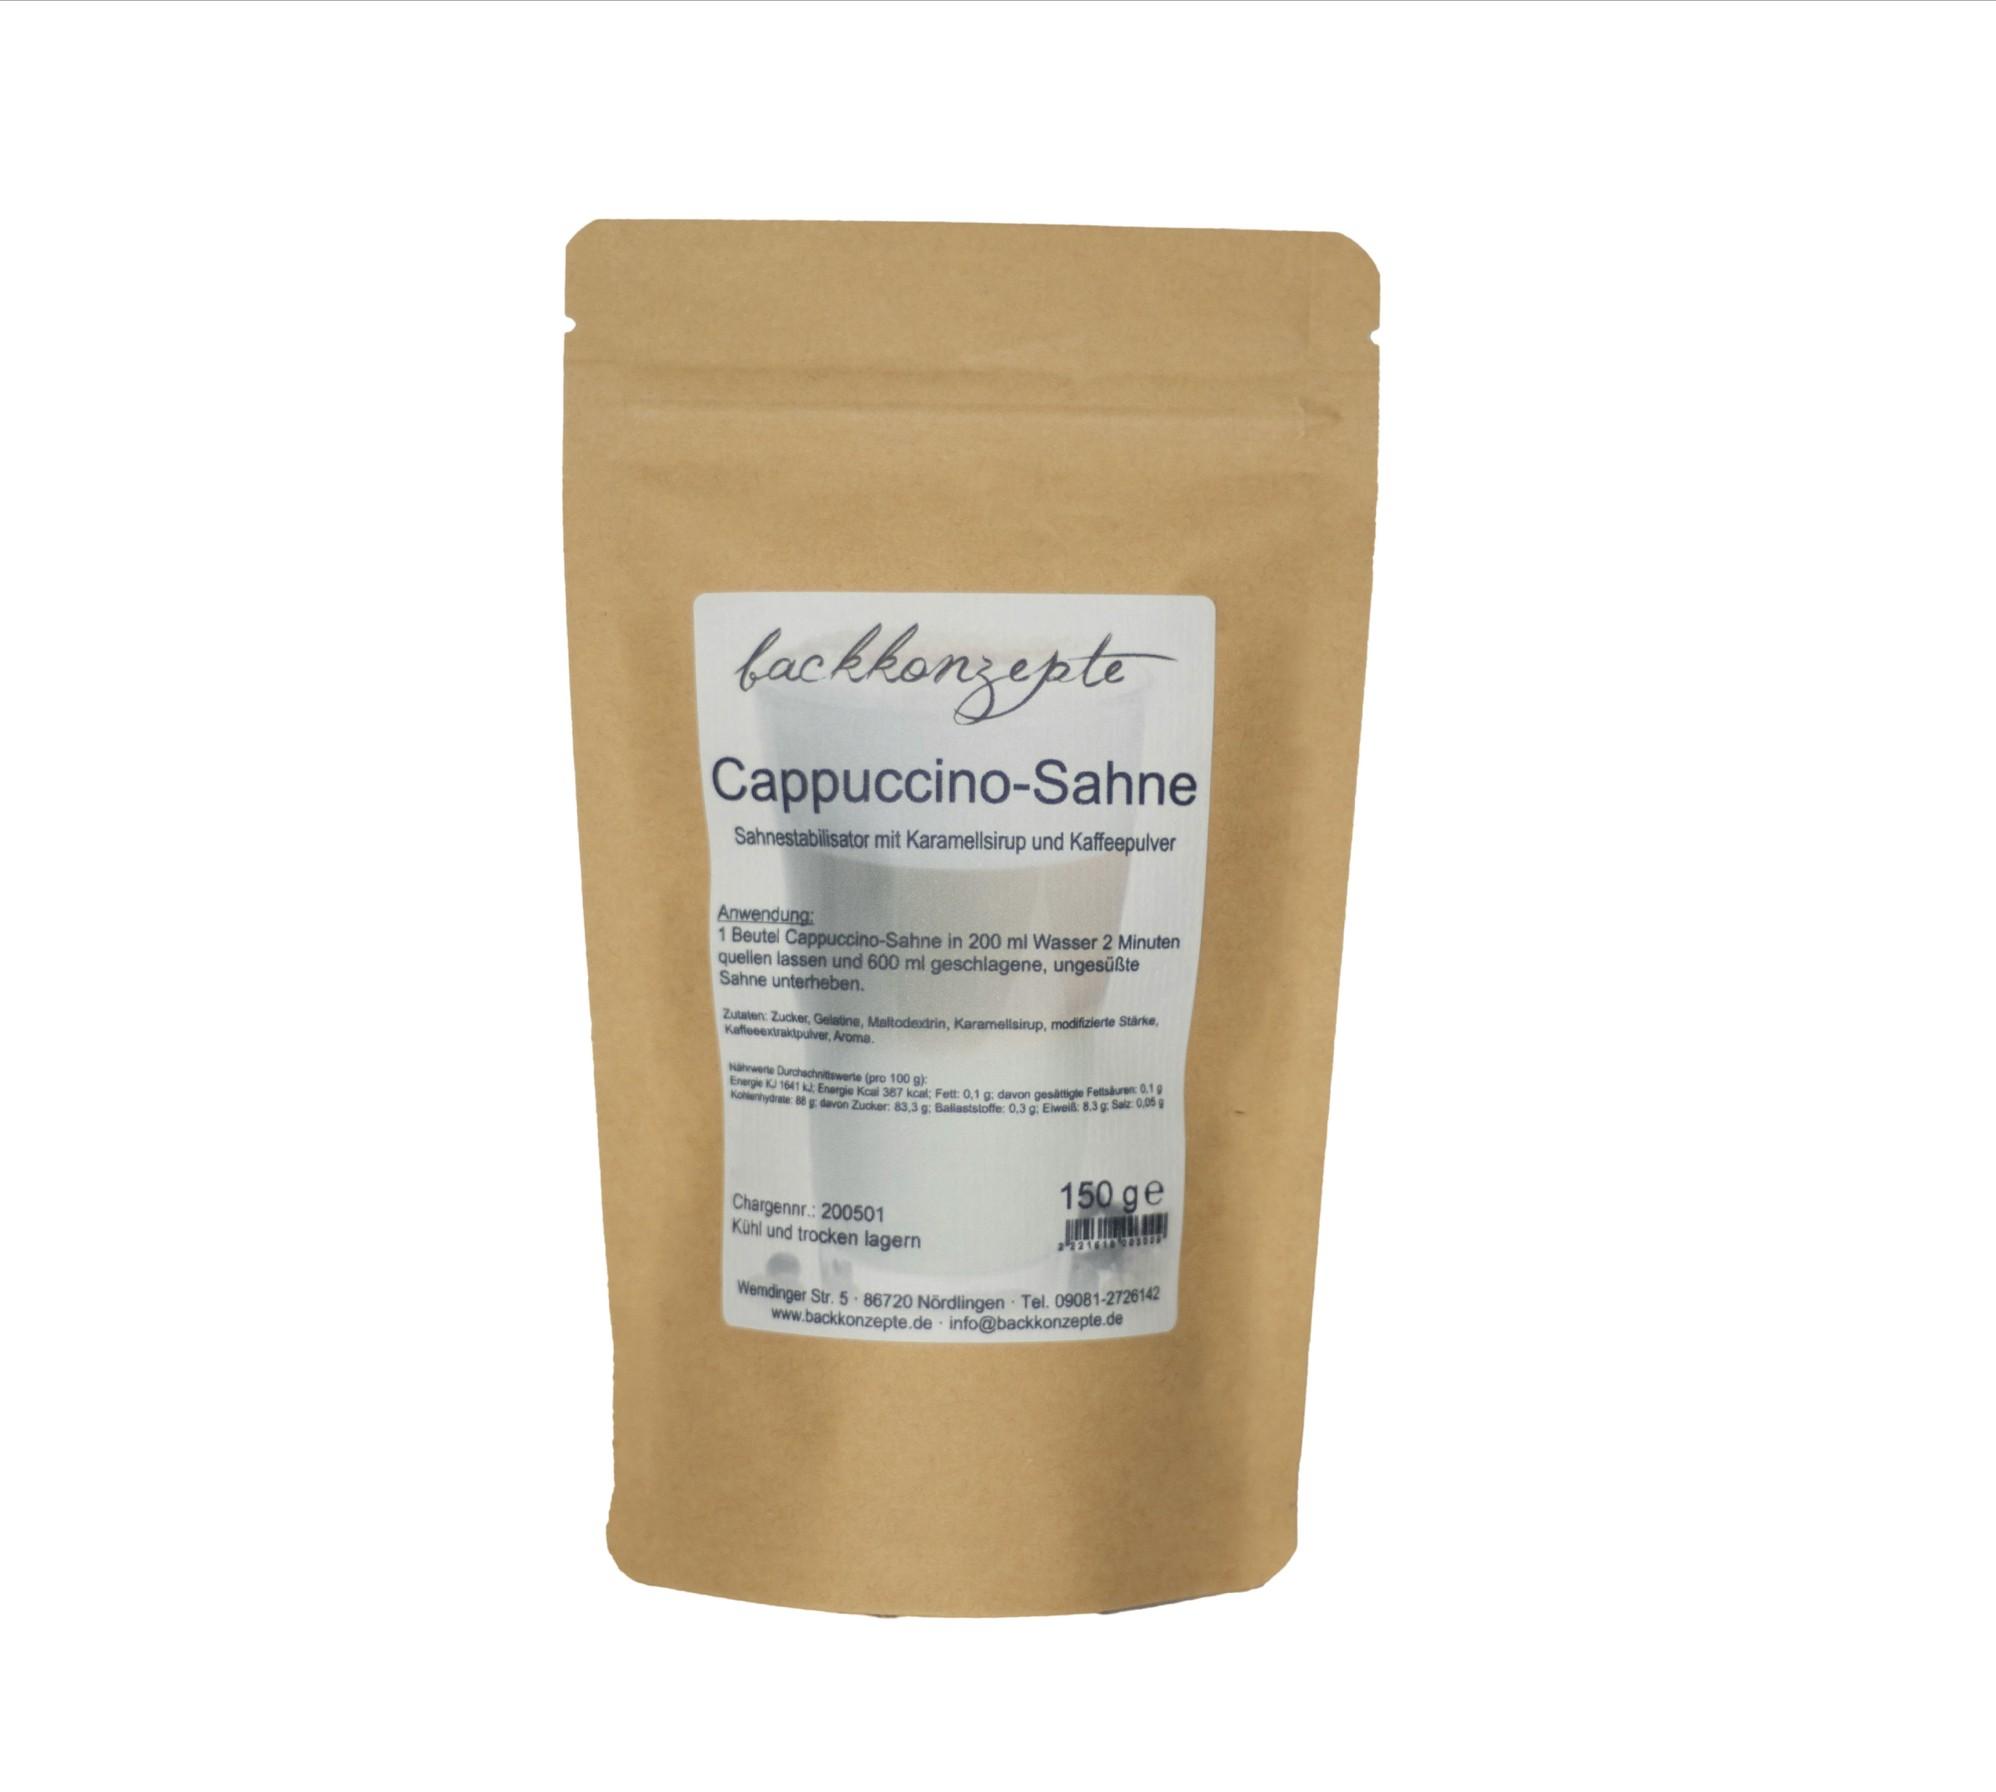 Cappuccino-Sahne 150g